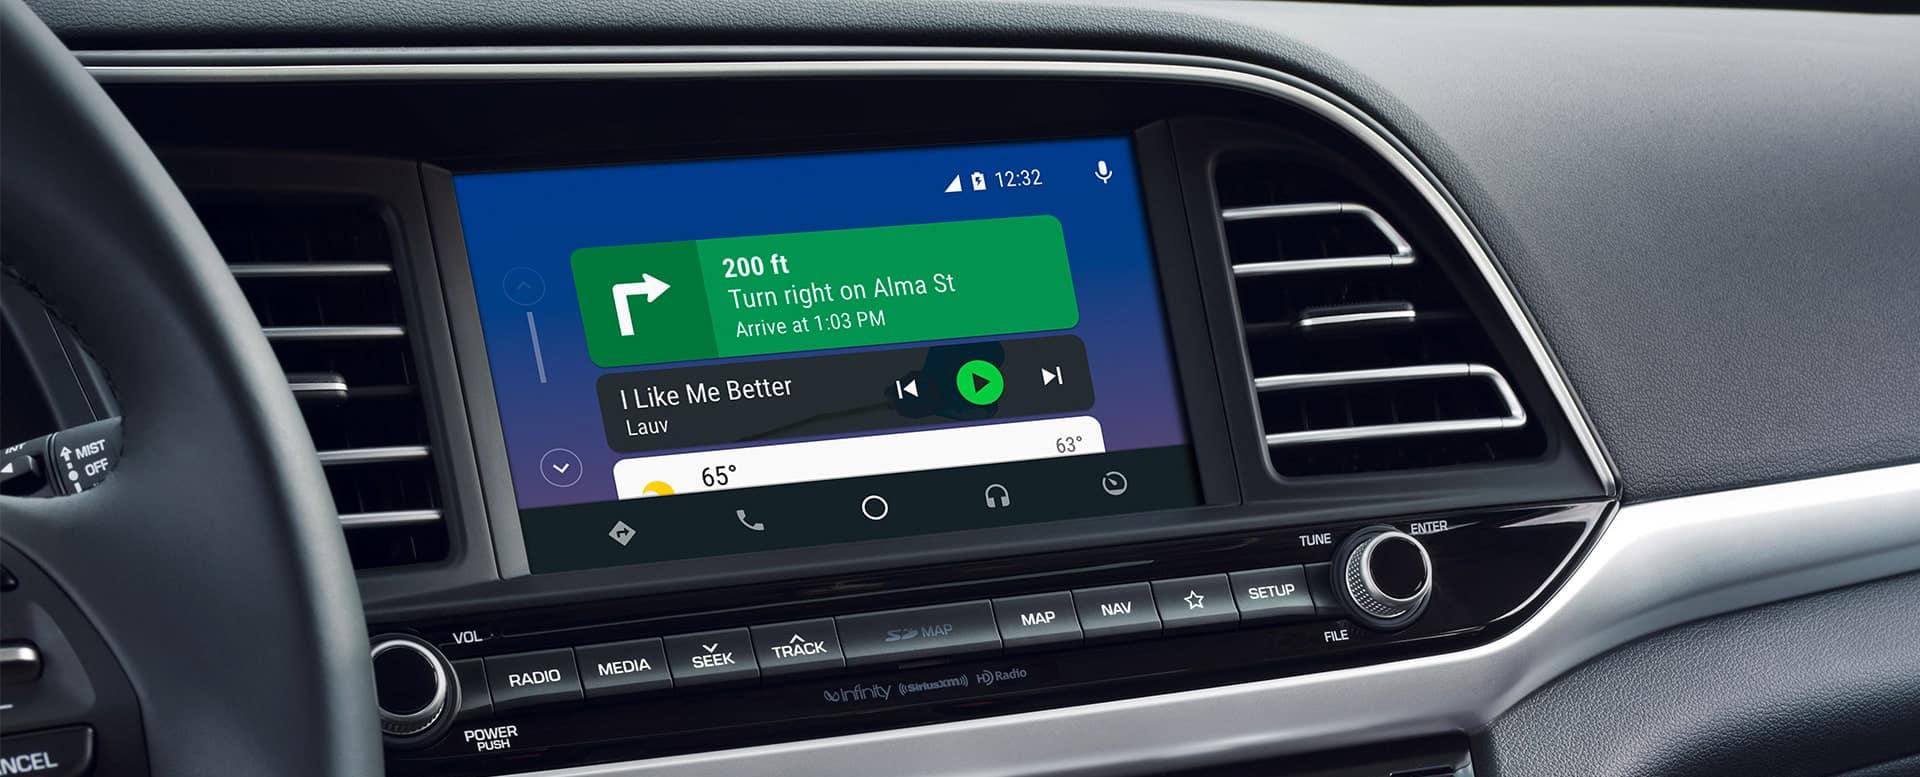 2020 Hyundai Elantra Media